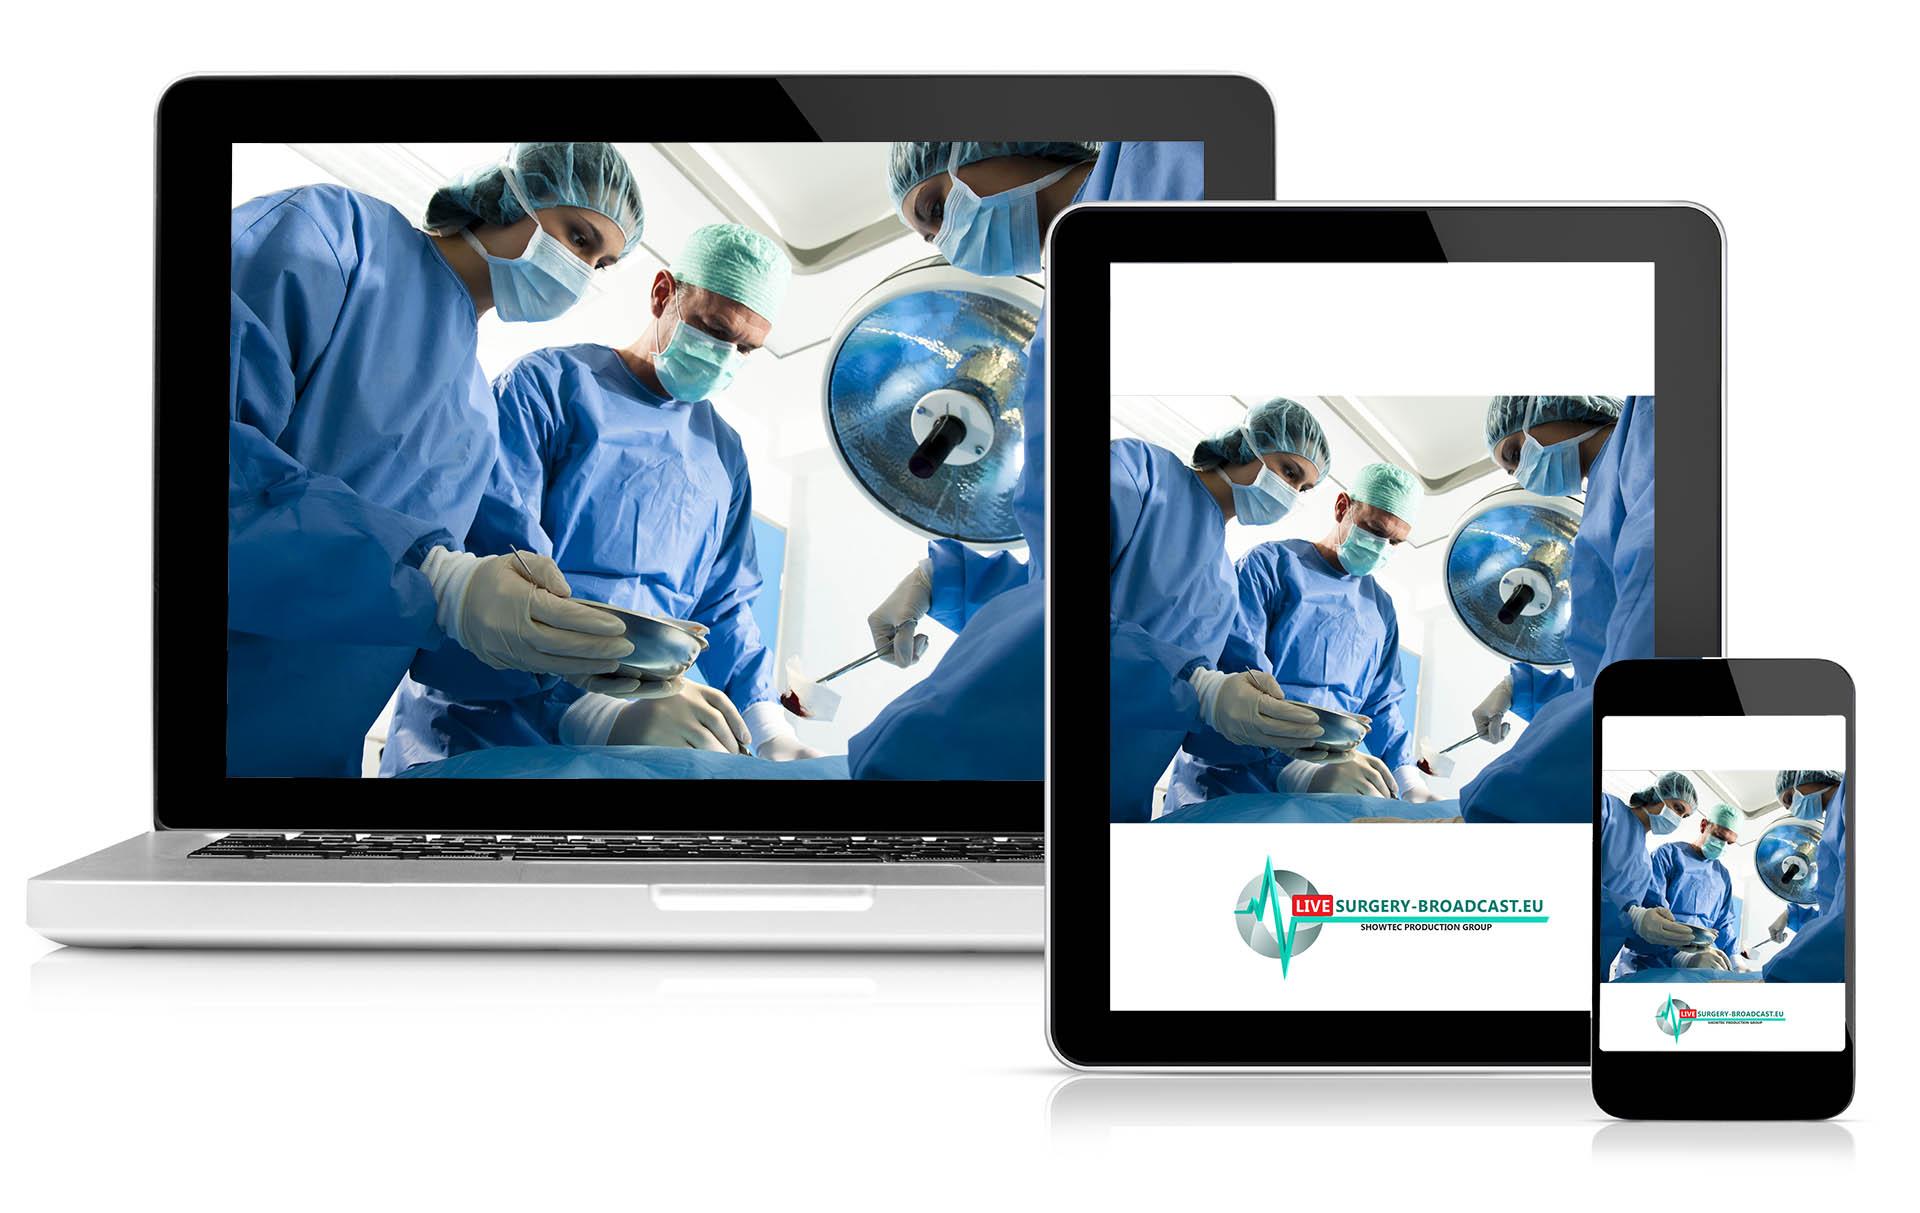 live surgery webcast chennai